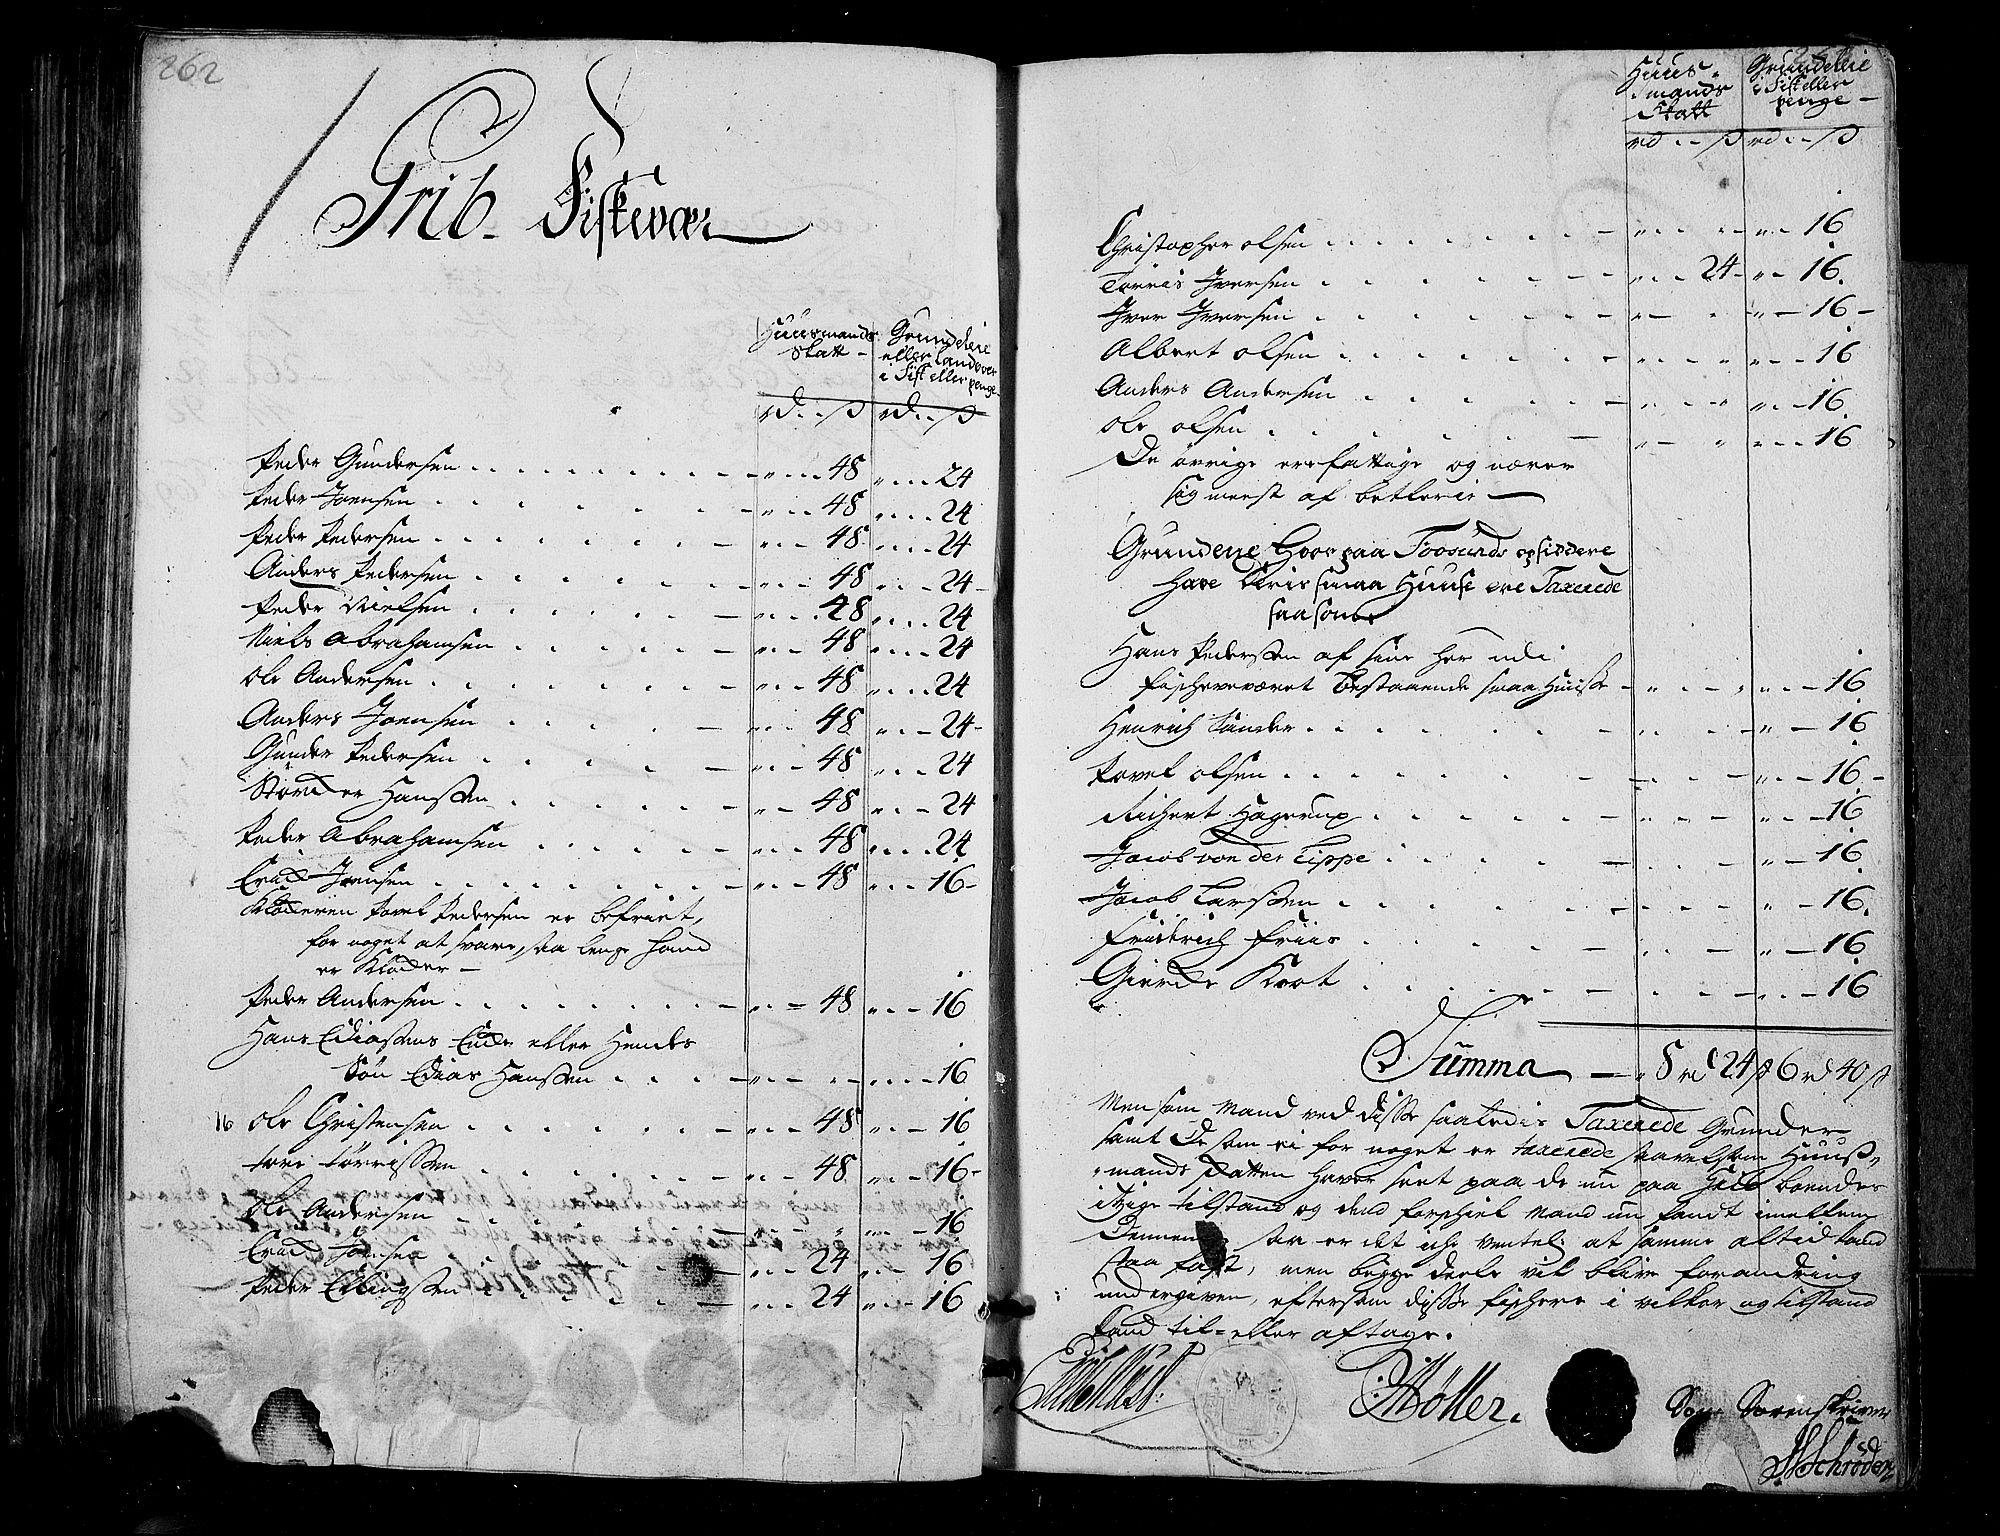 RA, Rentekammeret inntil 1814, Realistisk ordnet avdeling, N/Nb/Nbf/L0155: Nordmøre matrikkelprotokoll, 1721-1723, s. 262-263